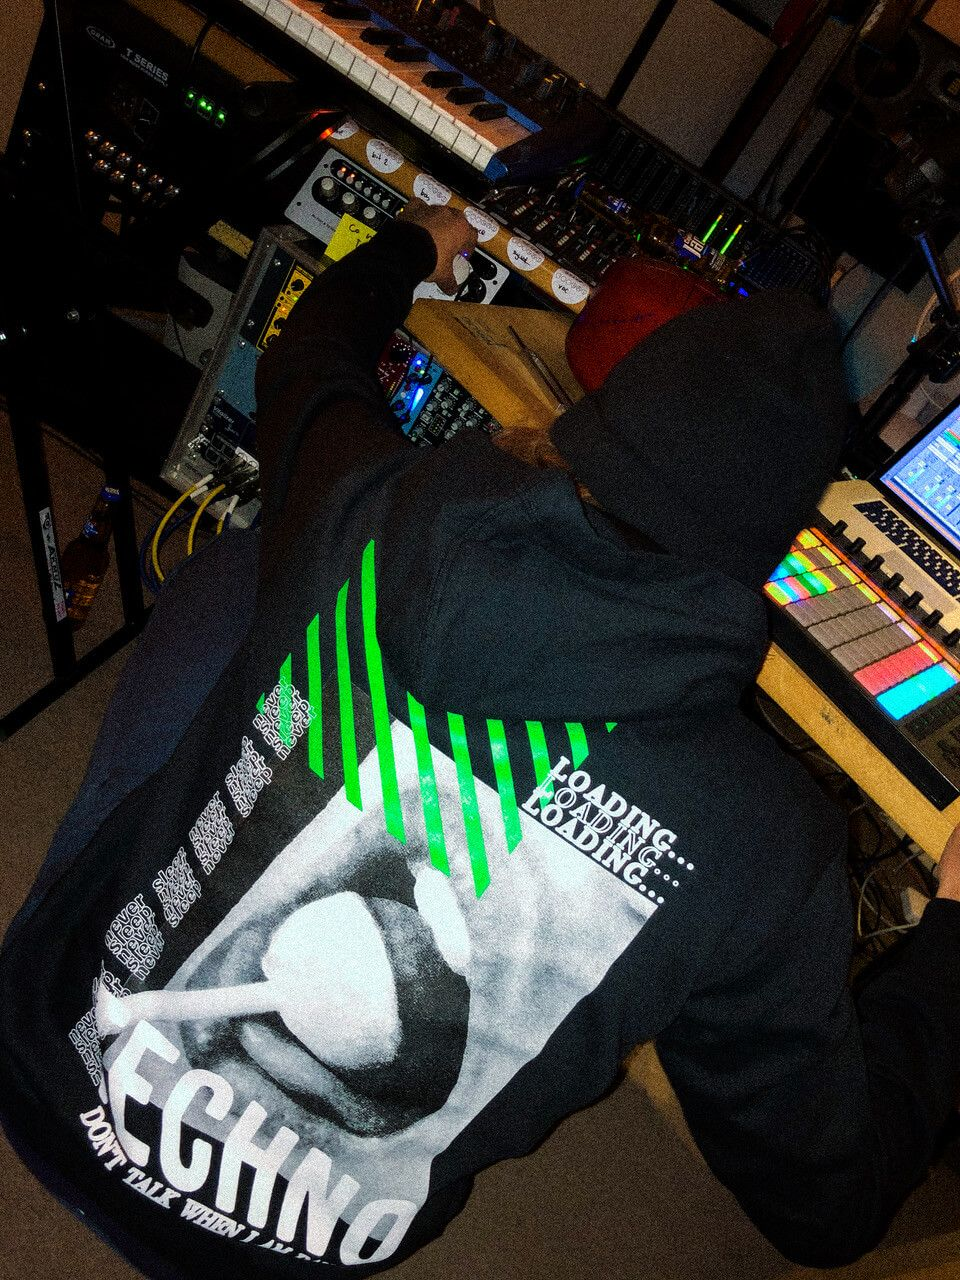 Techno backstage